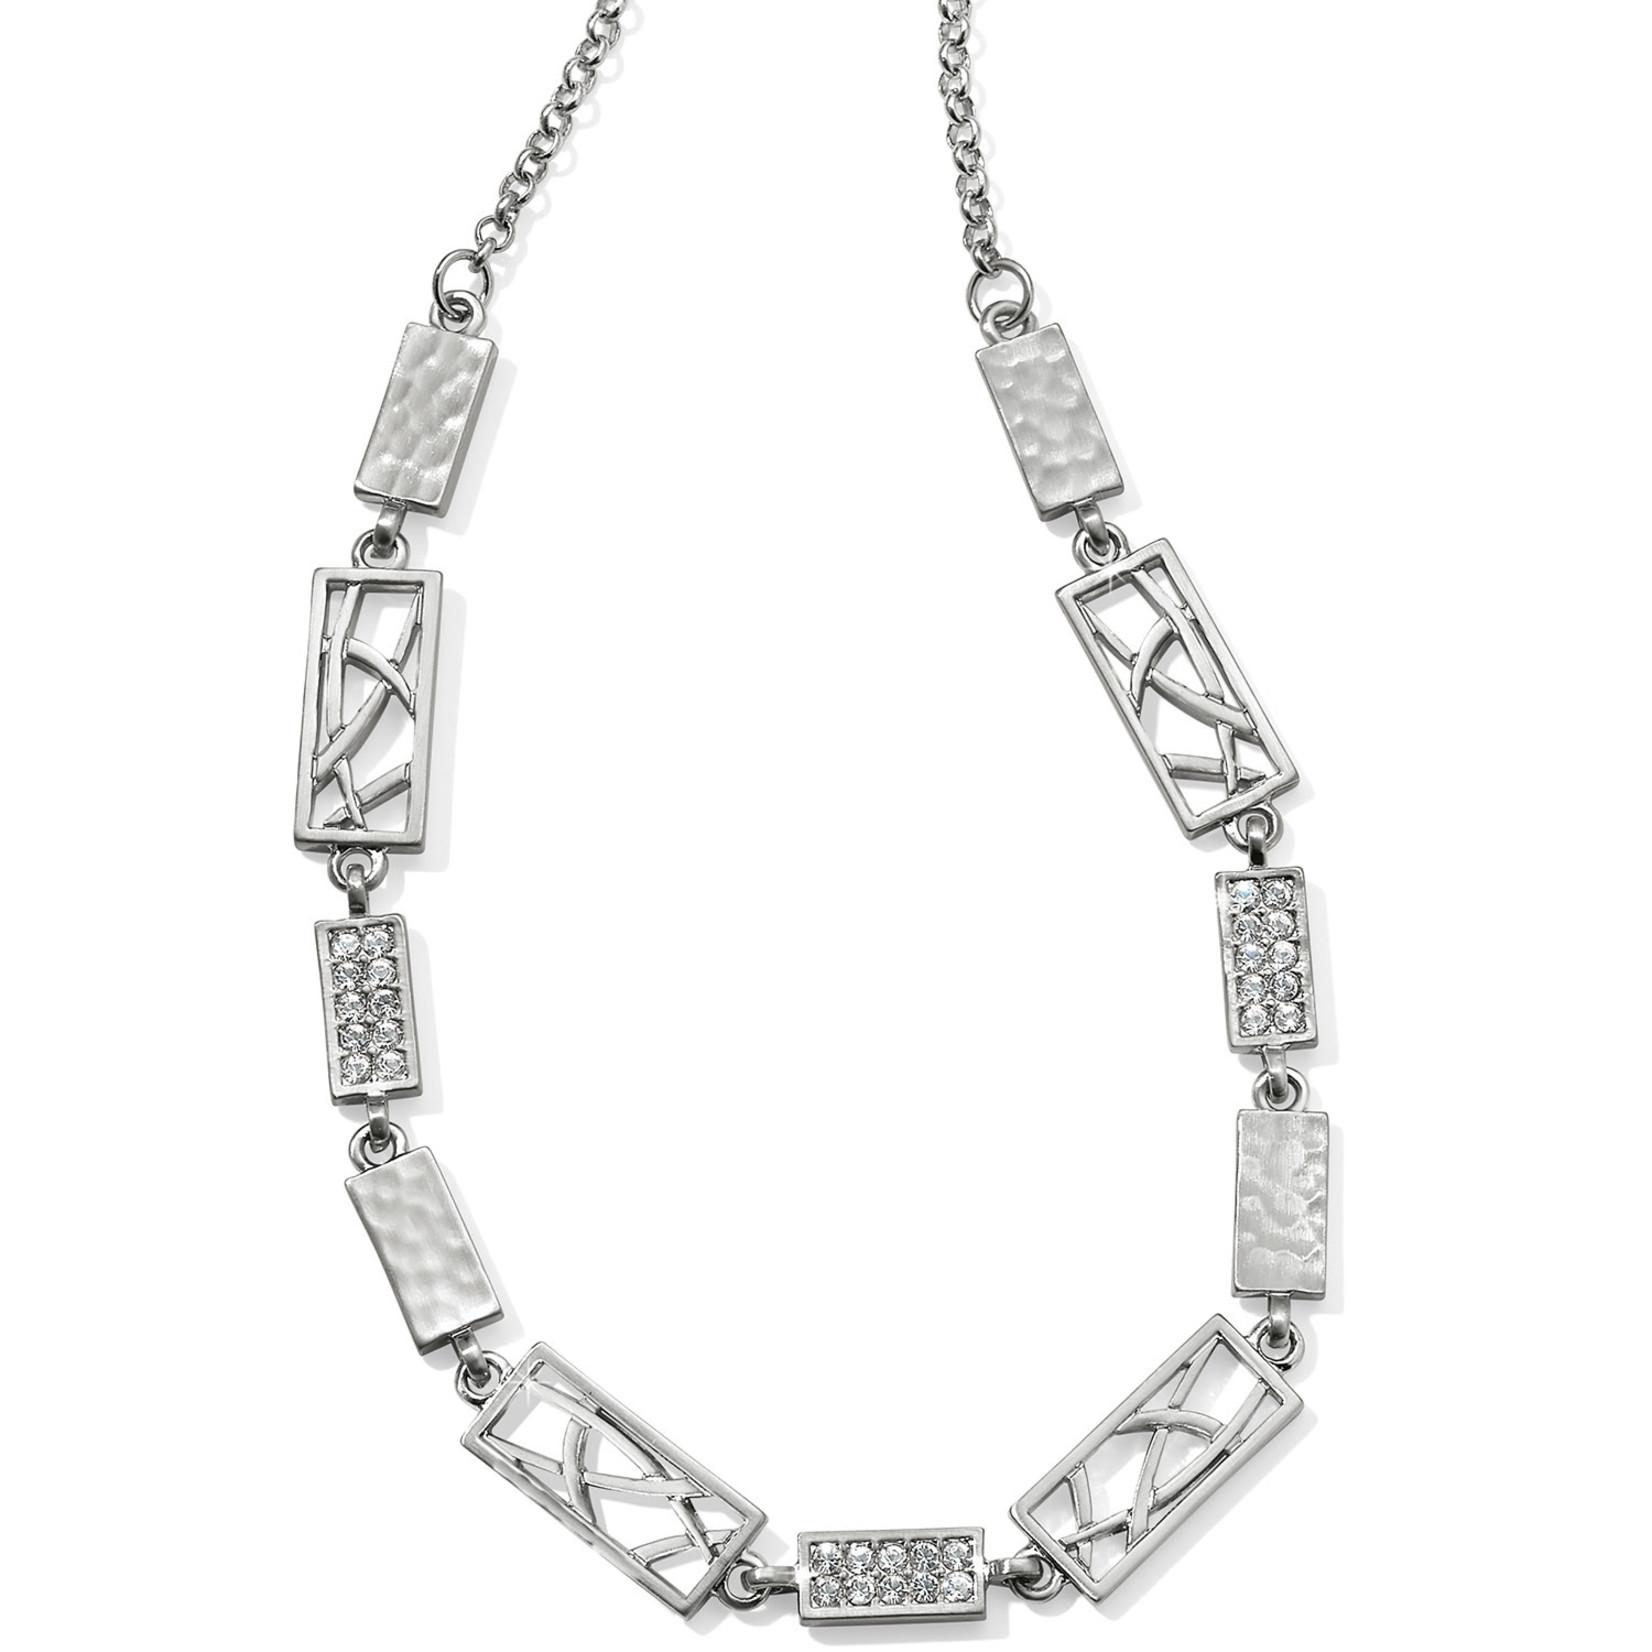 Brighton Meridian Zenith Choker Necklace Silver